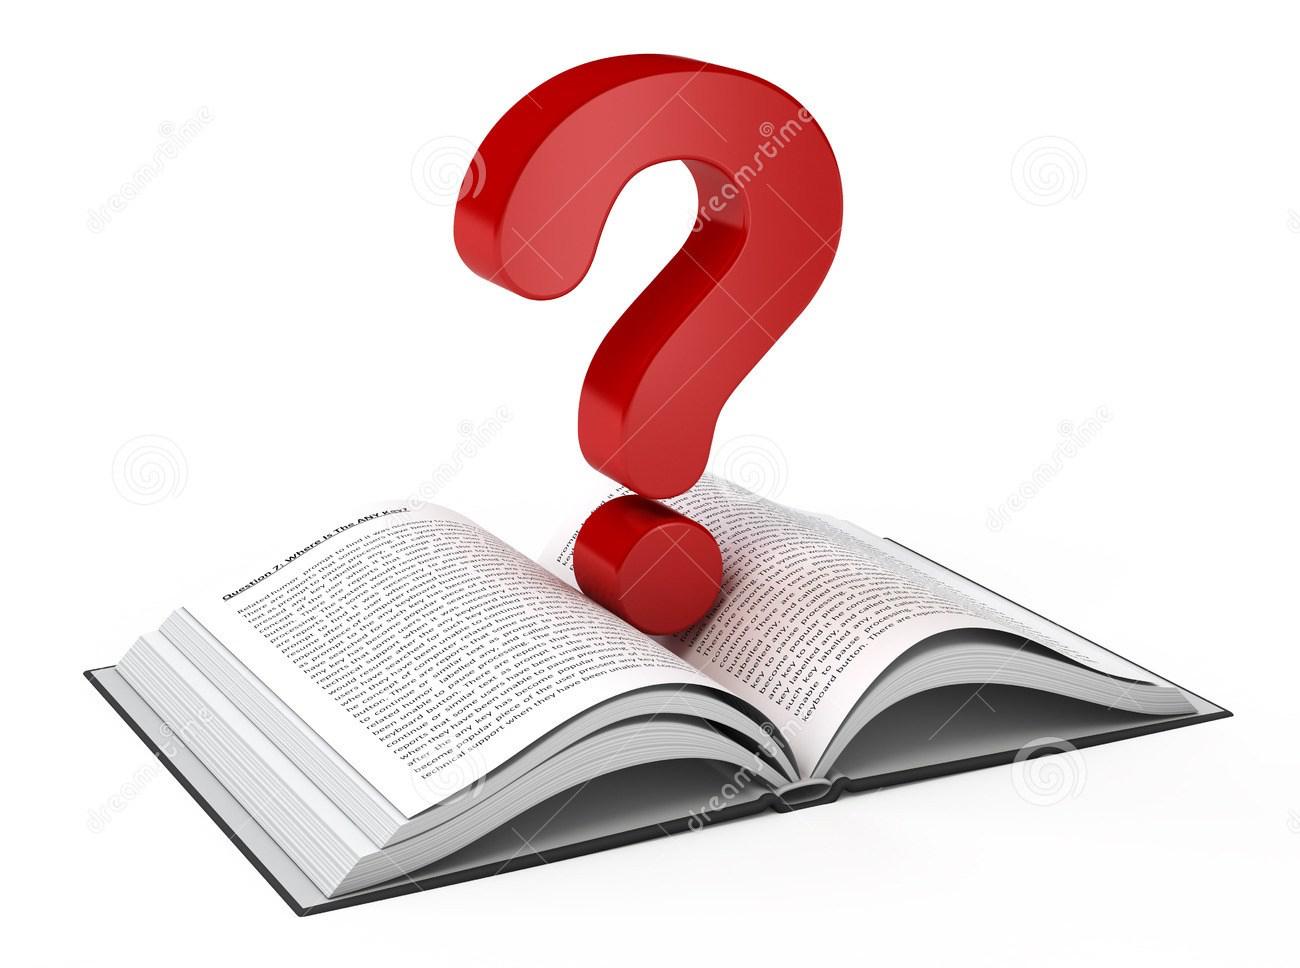 open-book-question-mark-27280720